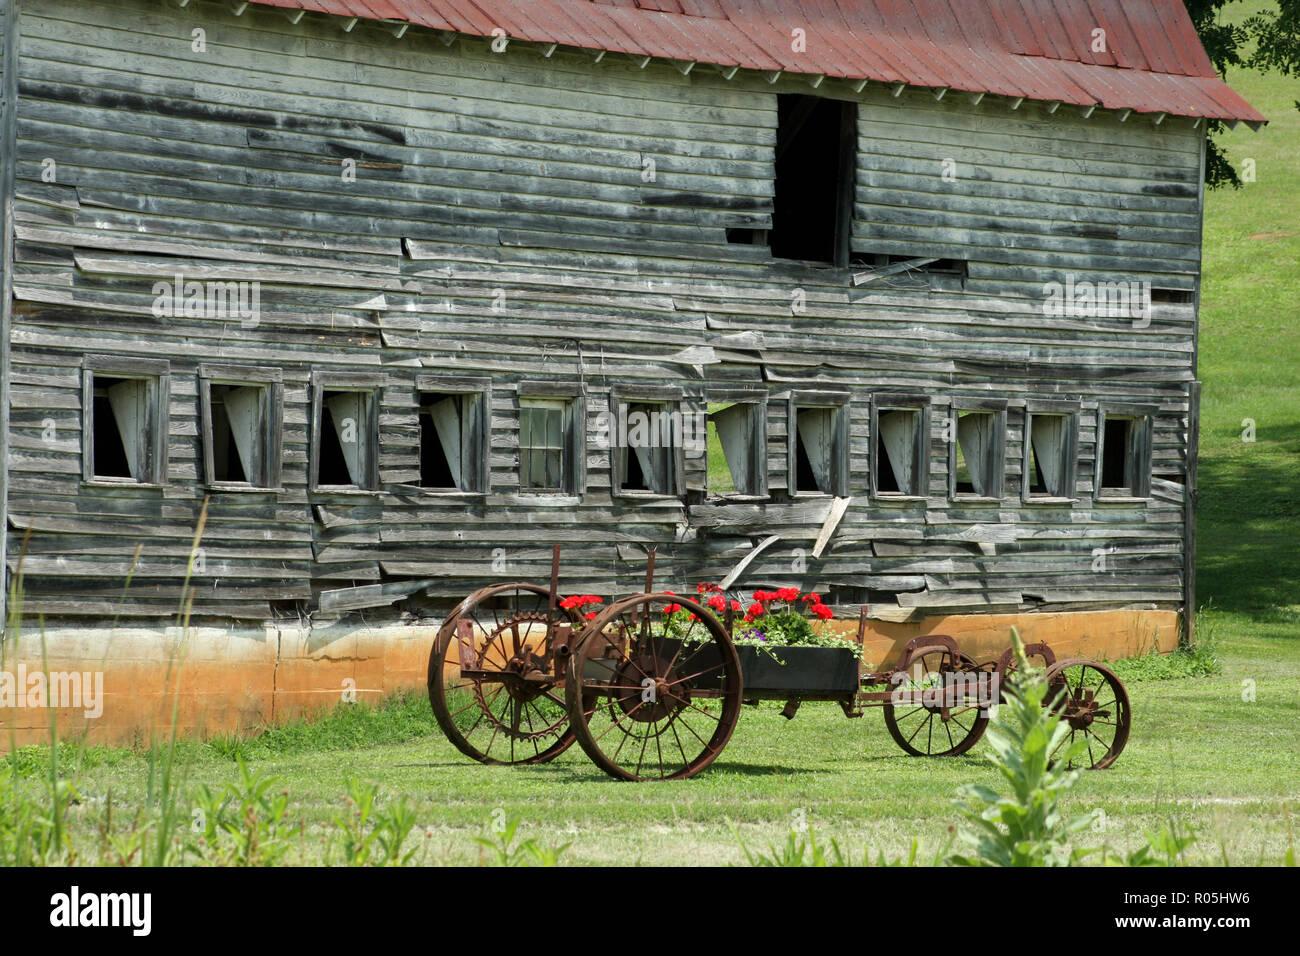 Wagon Part Old Wheel Stock Photos & Wagon Part Old Wheel